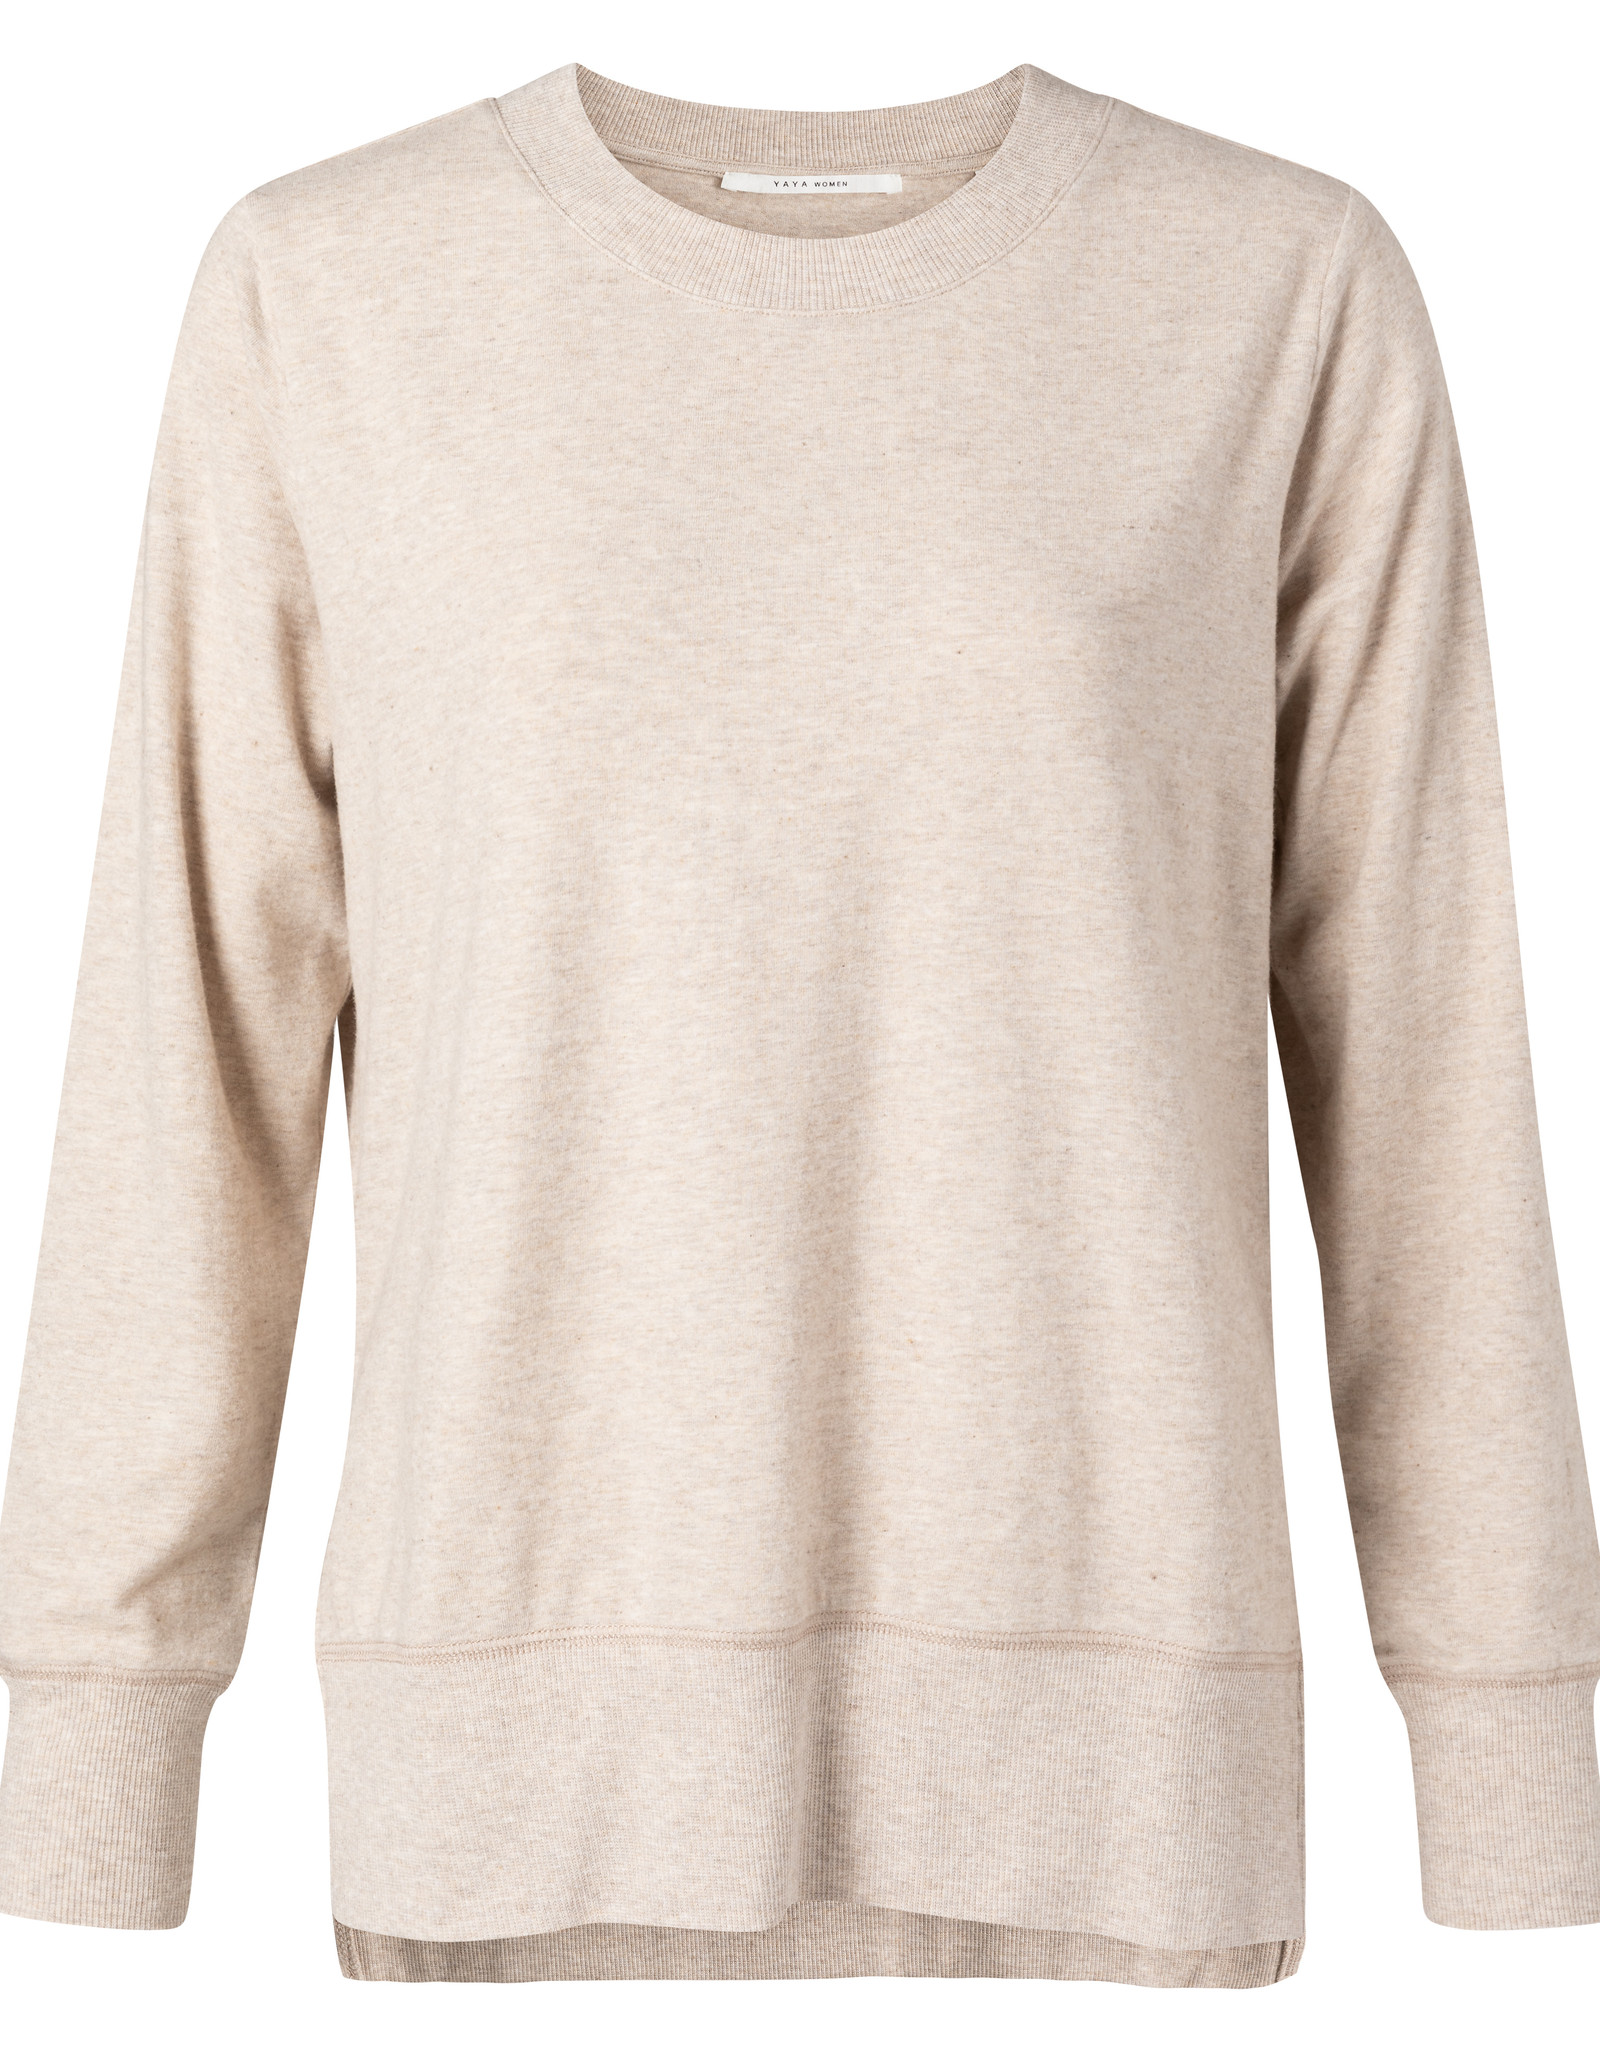 Yaya Anita Sweater